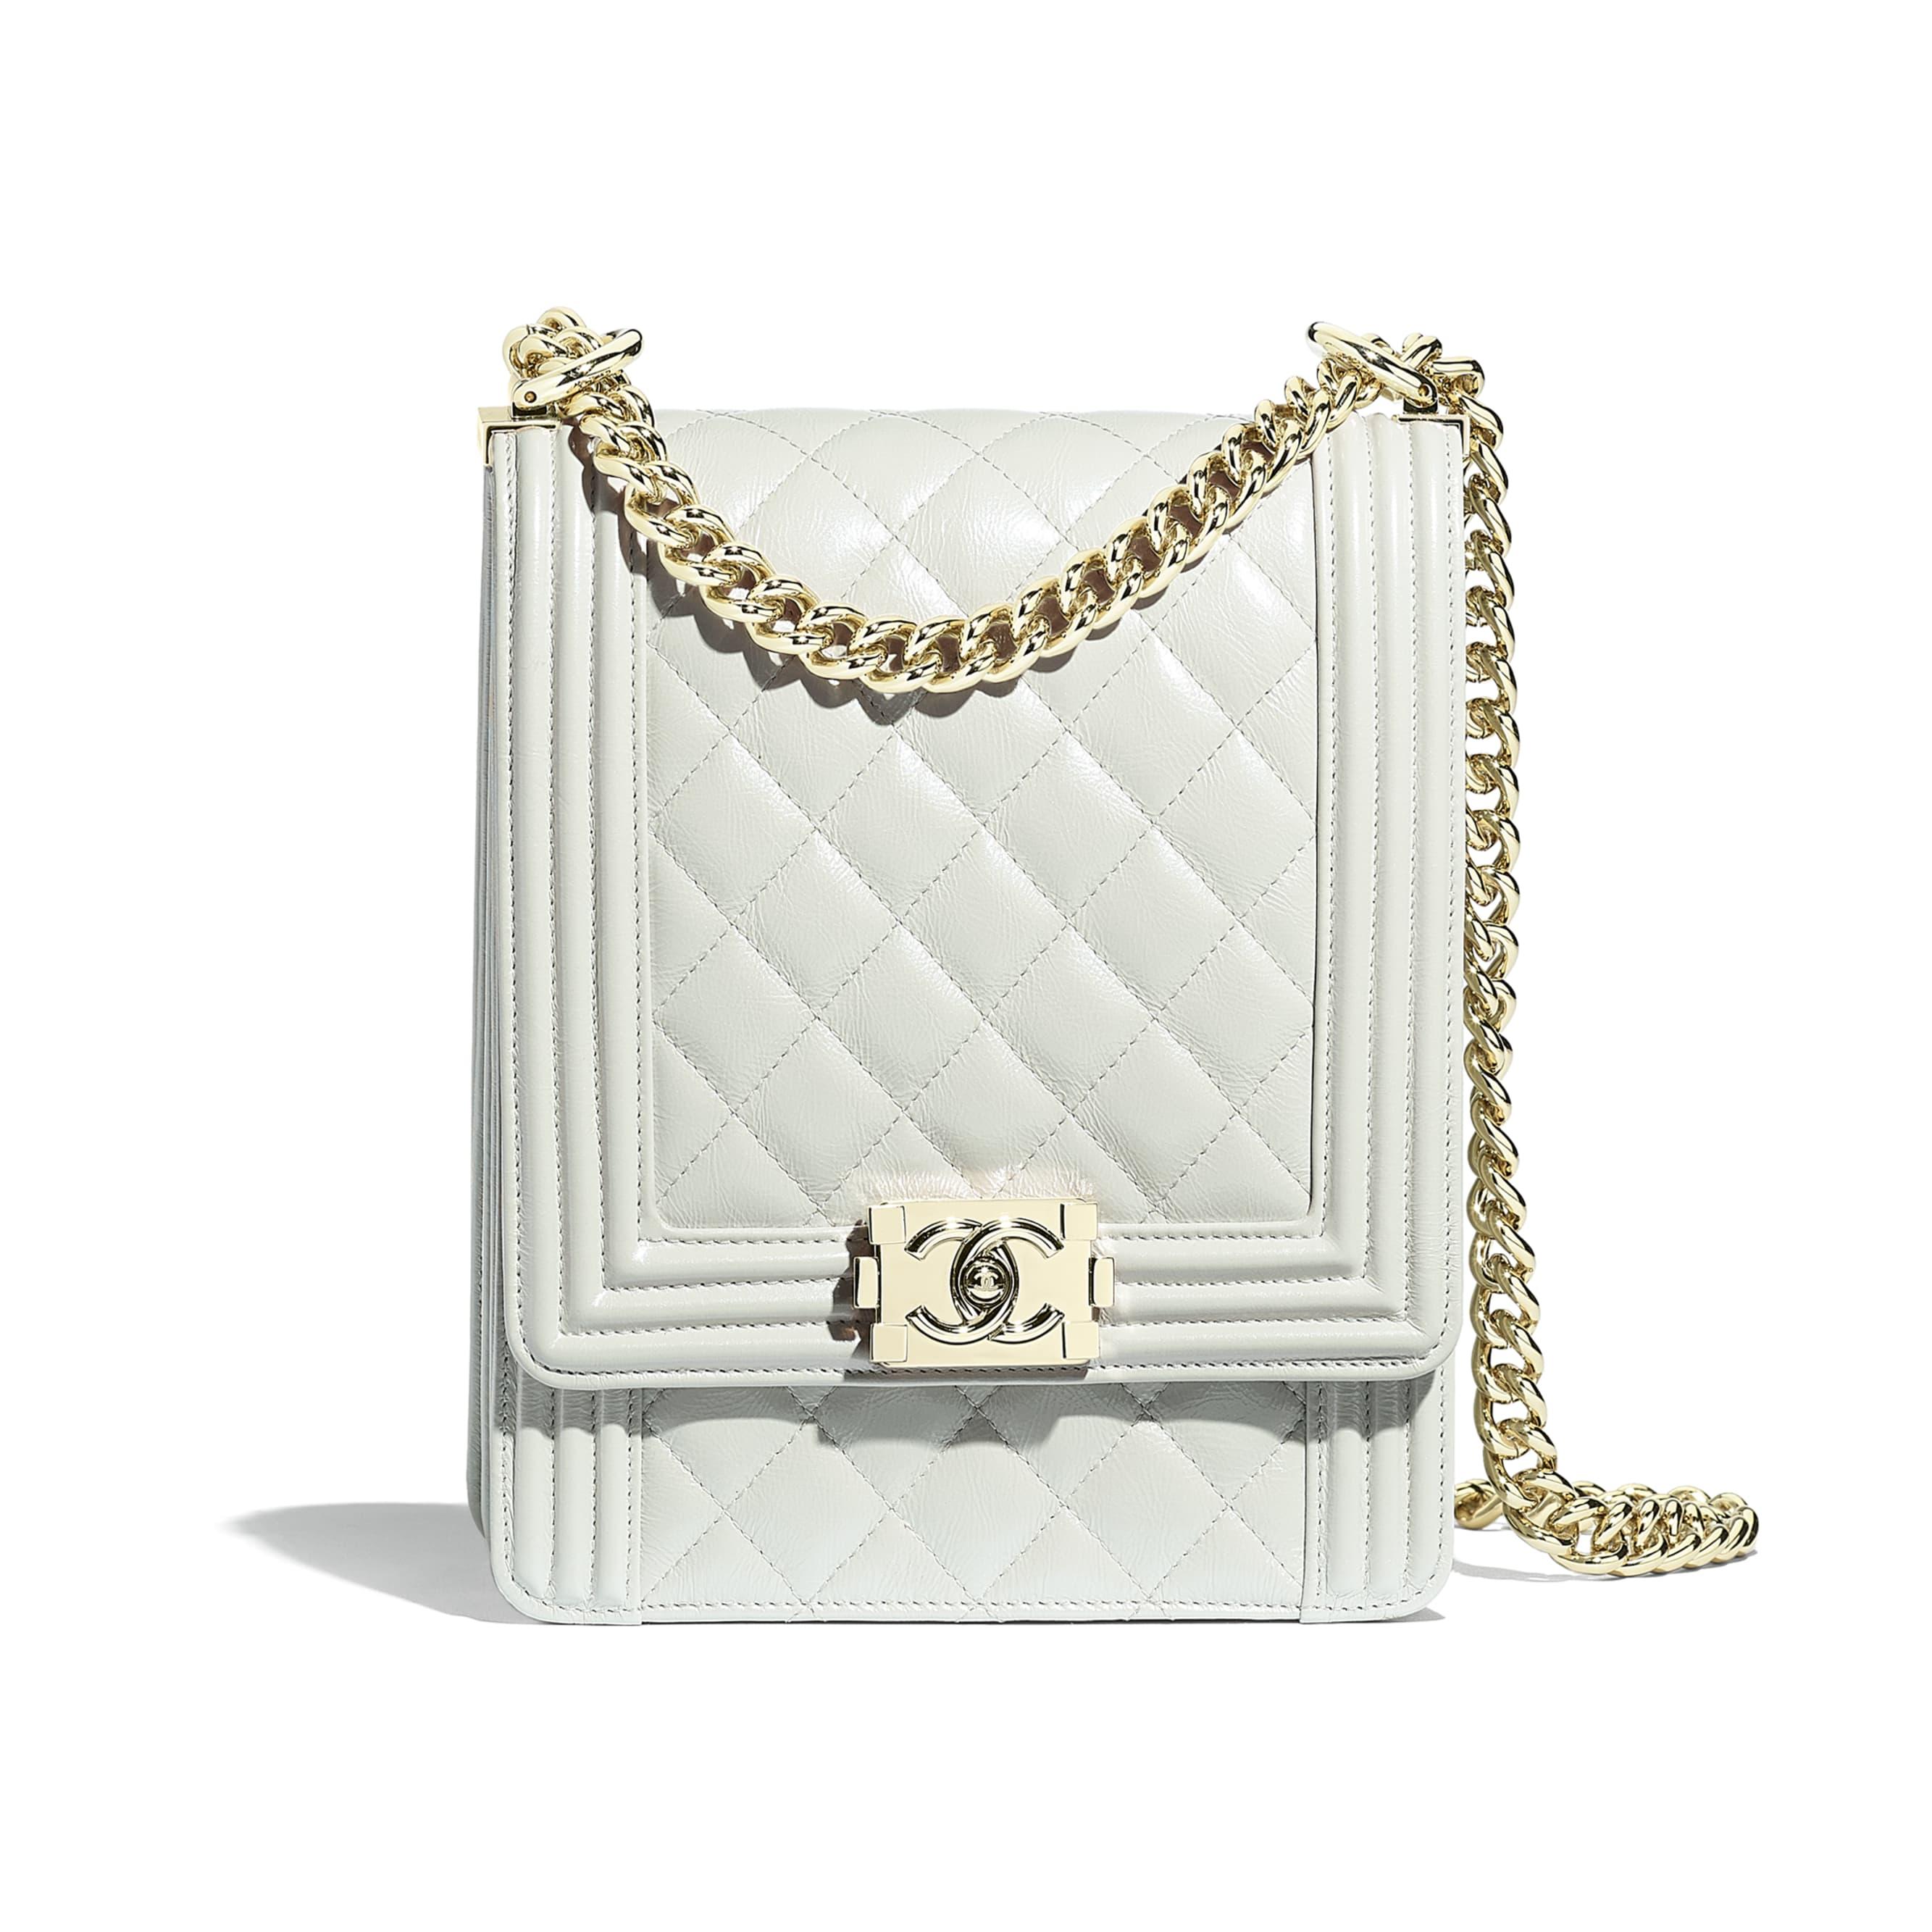 BOY CHANEL Handbag - Light Gray - Iridescent Calfskin & Gold-Tone Metal - Default view - see standard sized version